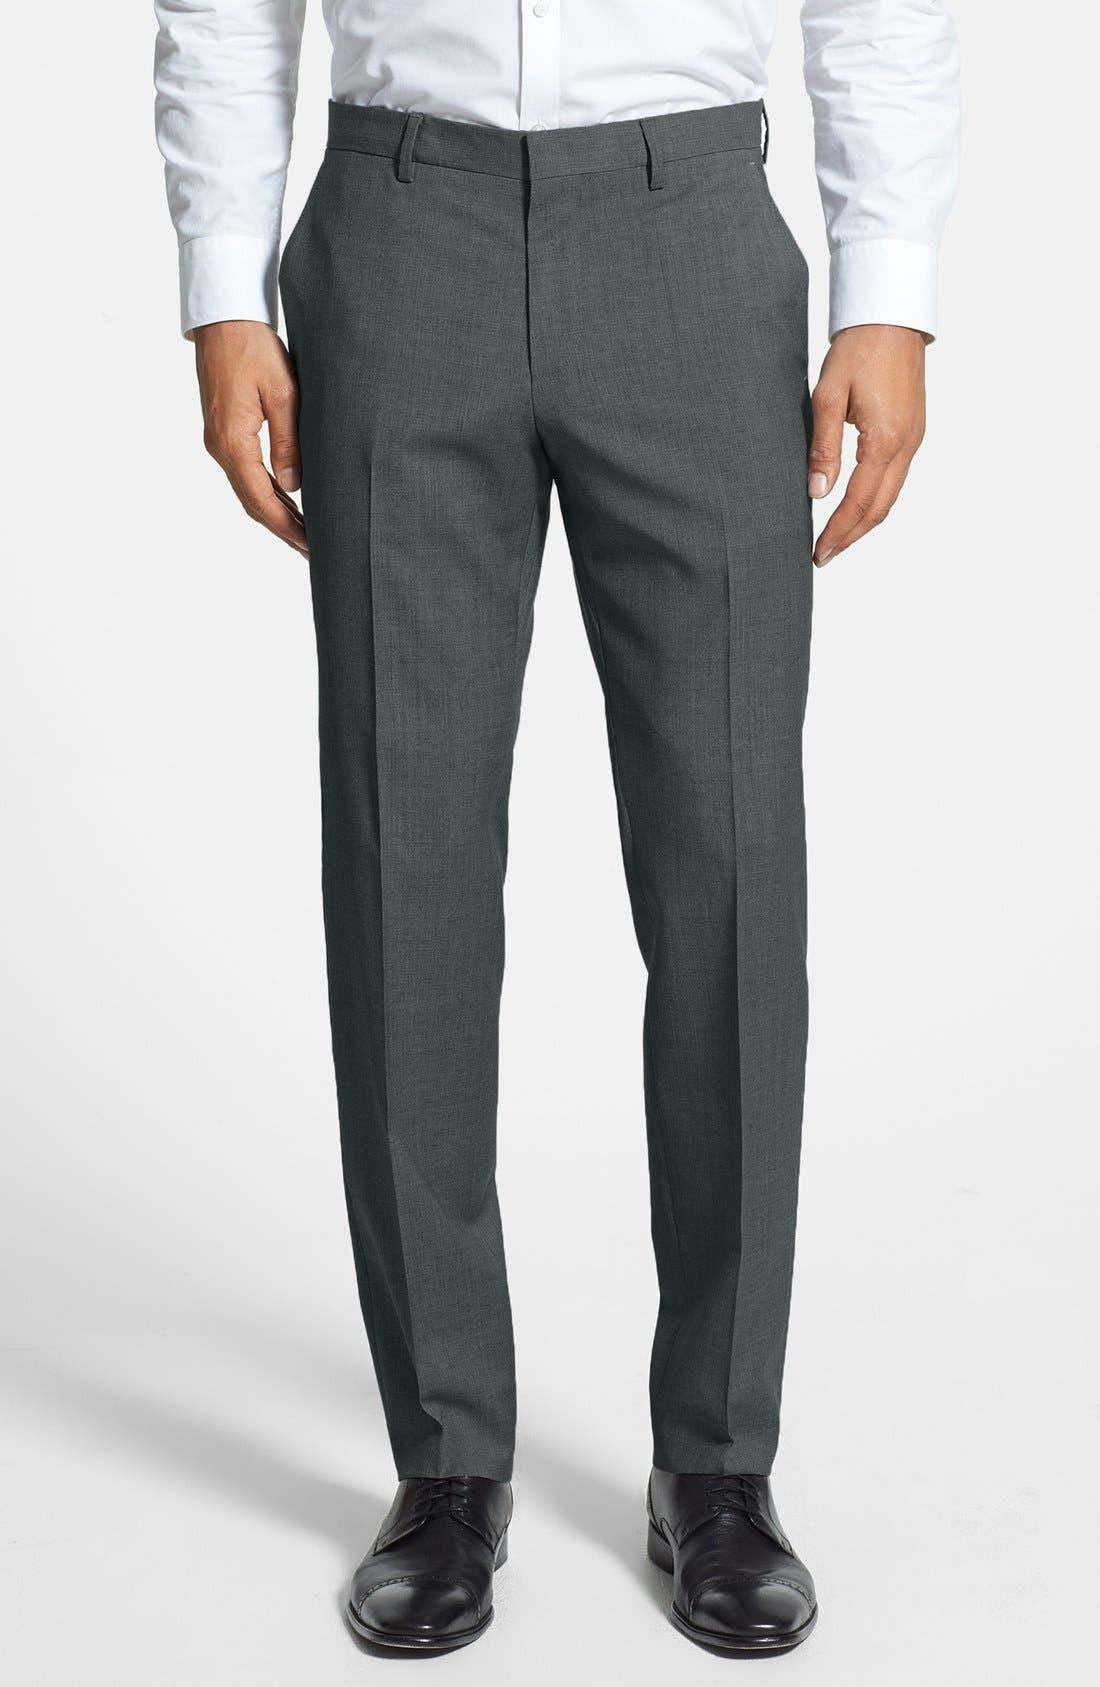 BOSS Genesis Flat Front Trim Fit Wool Trousers in Charcoal